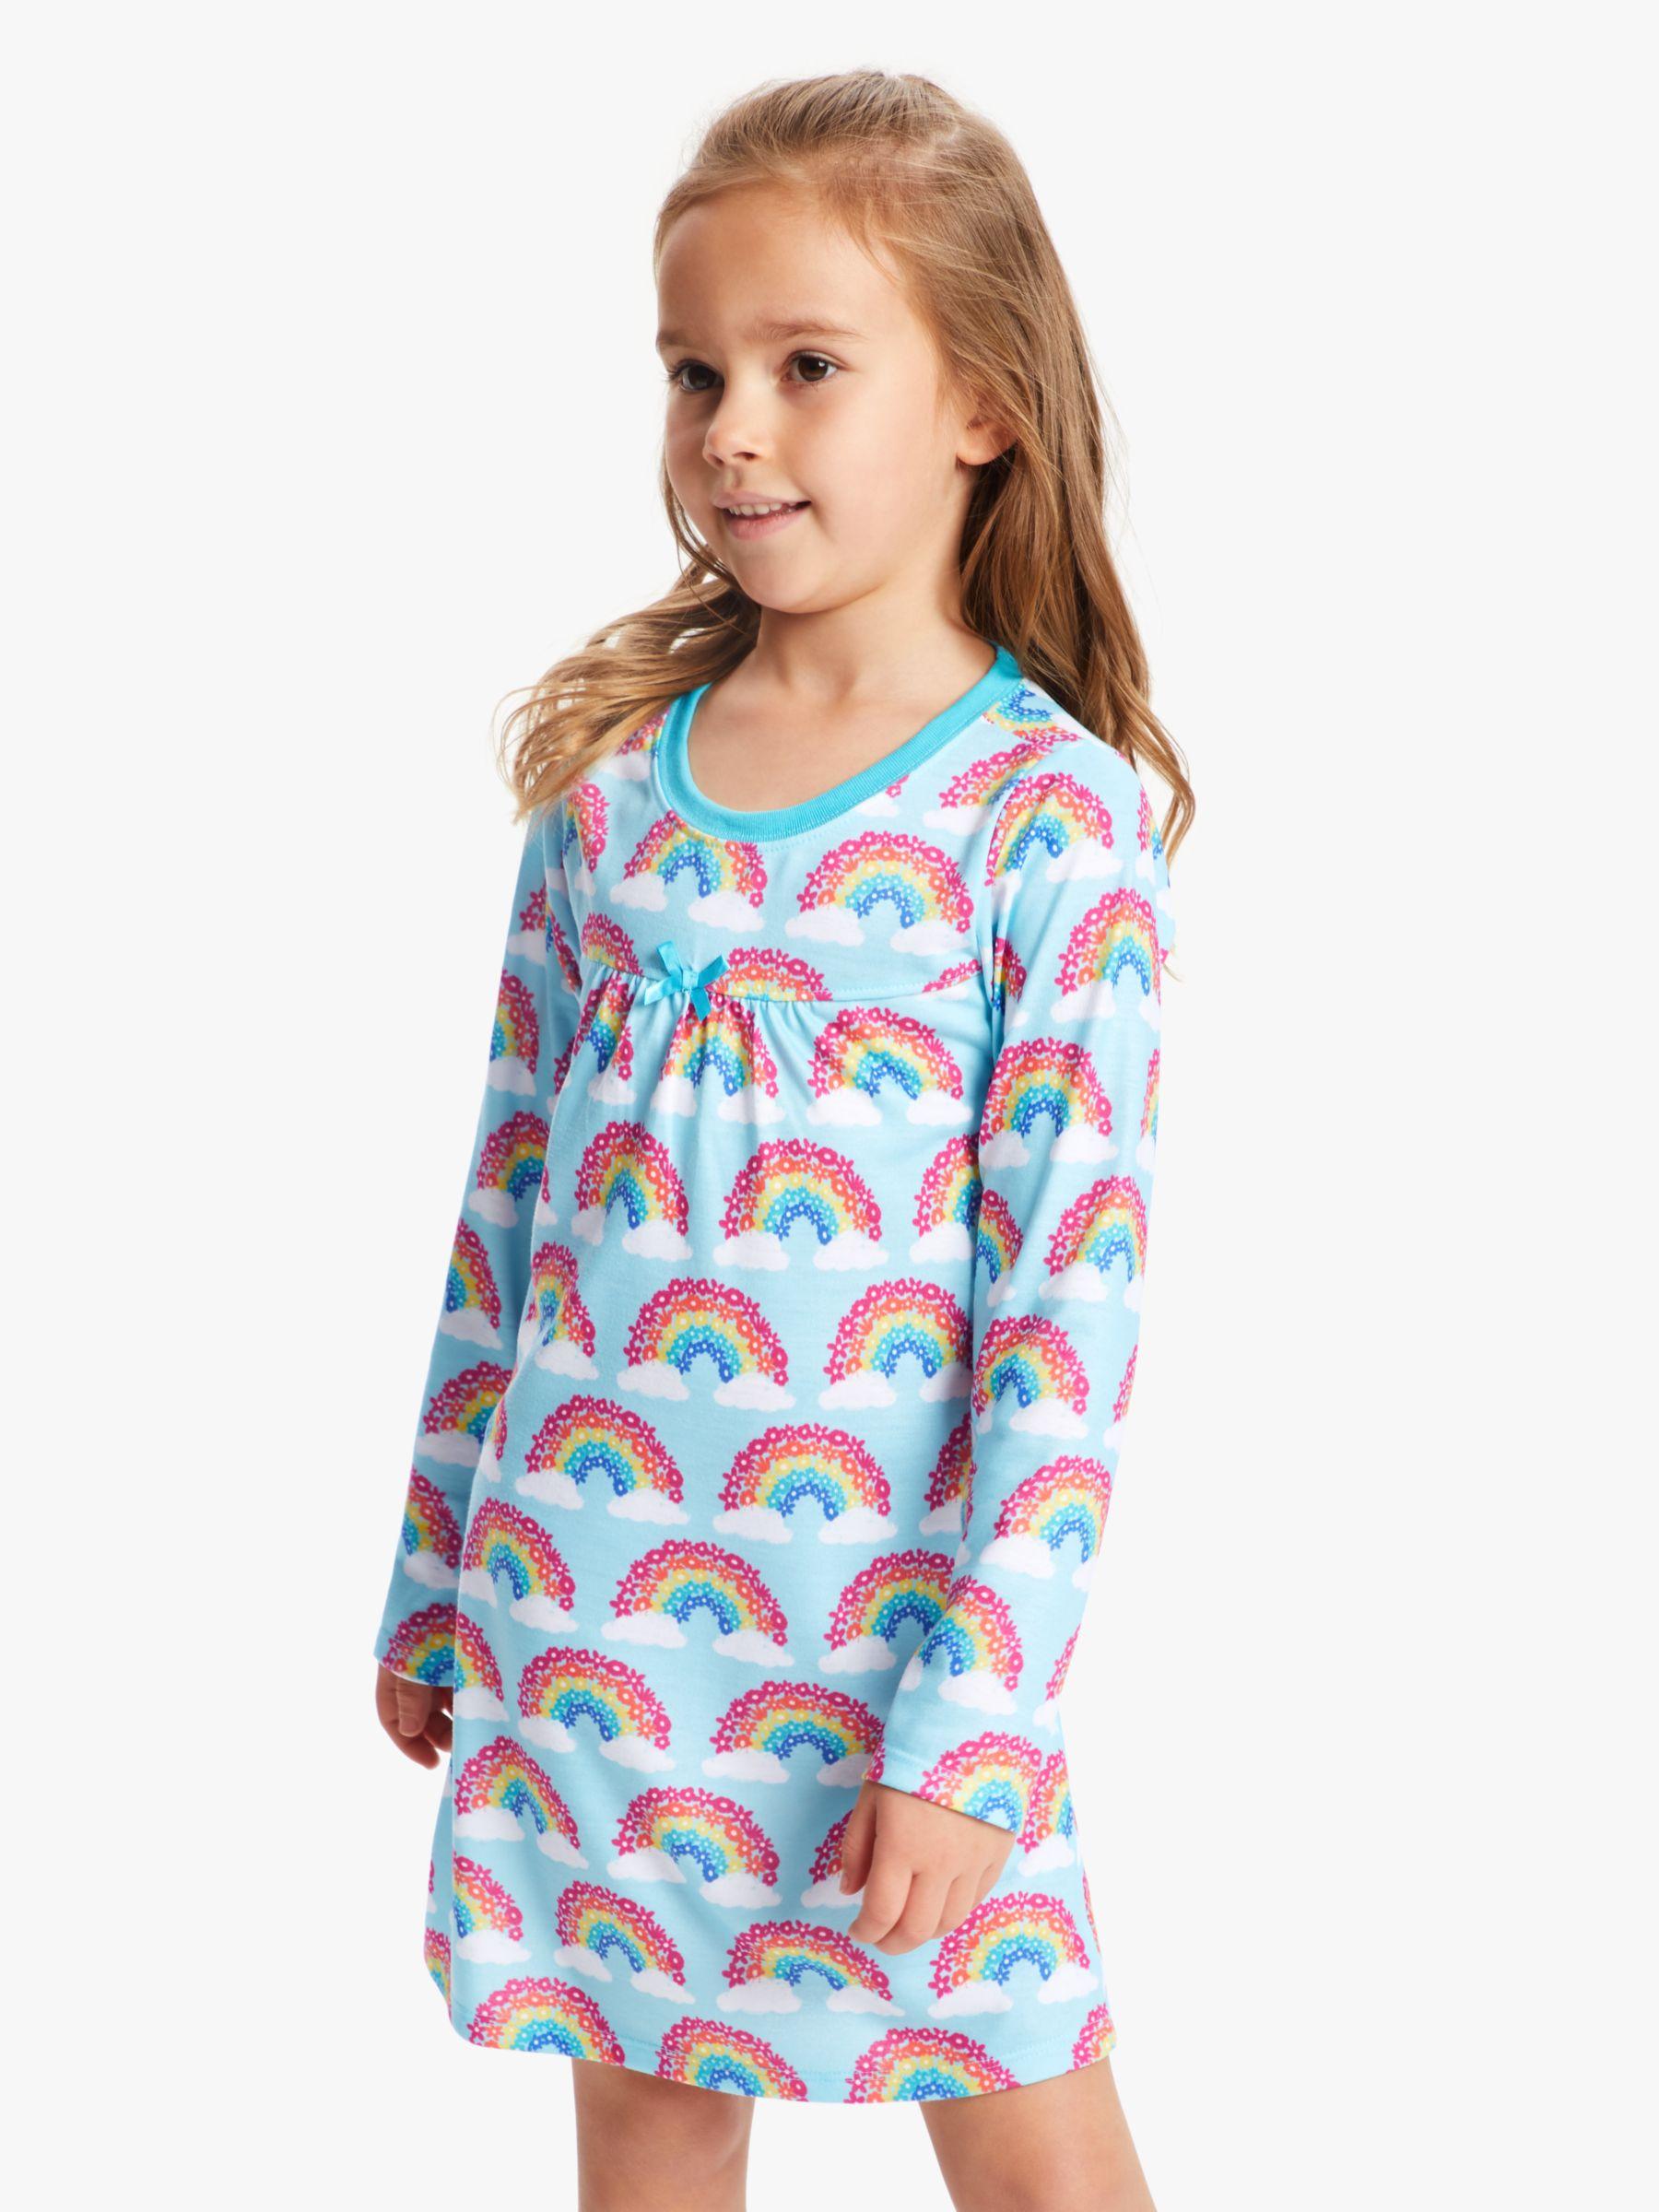 Hatley Hatley Girls' Rainbow Nightdress, Blue